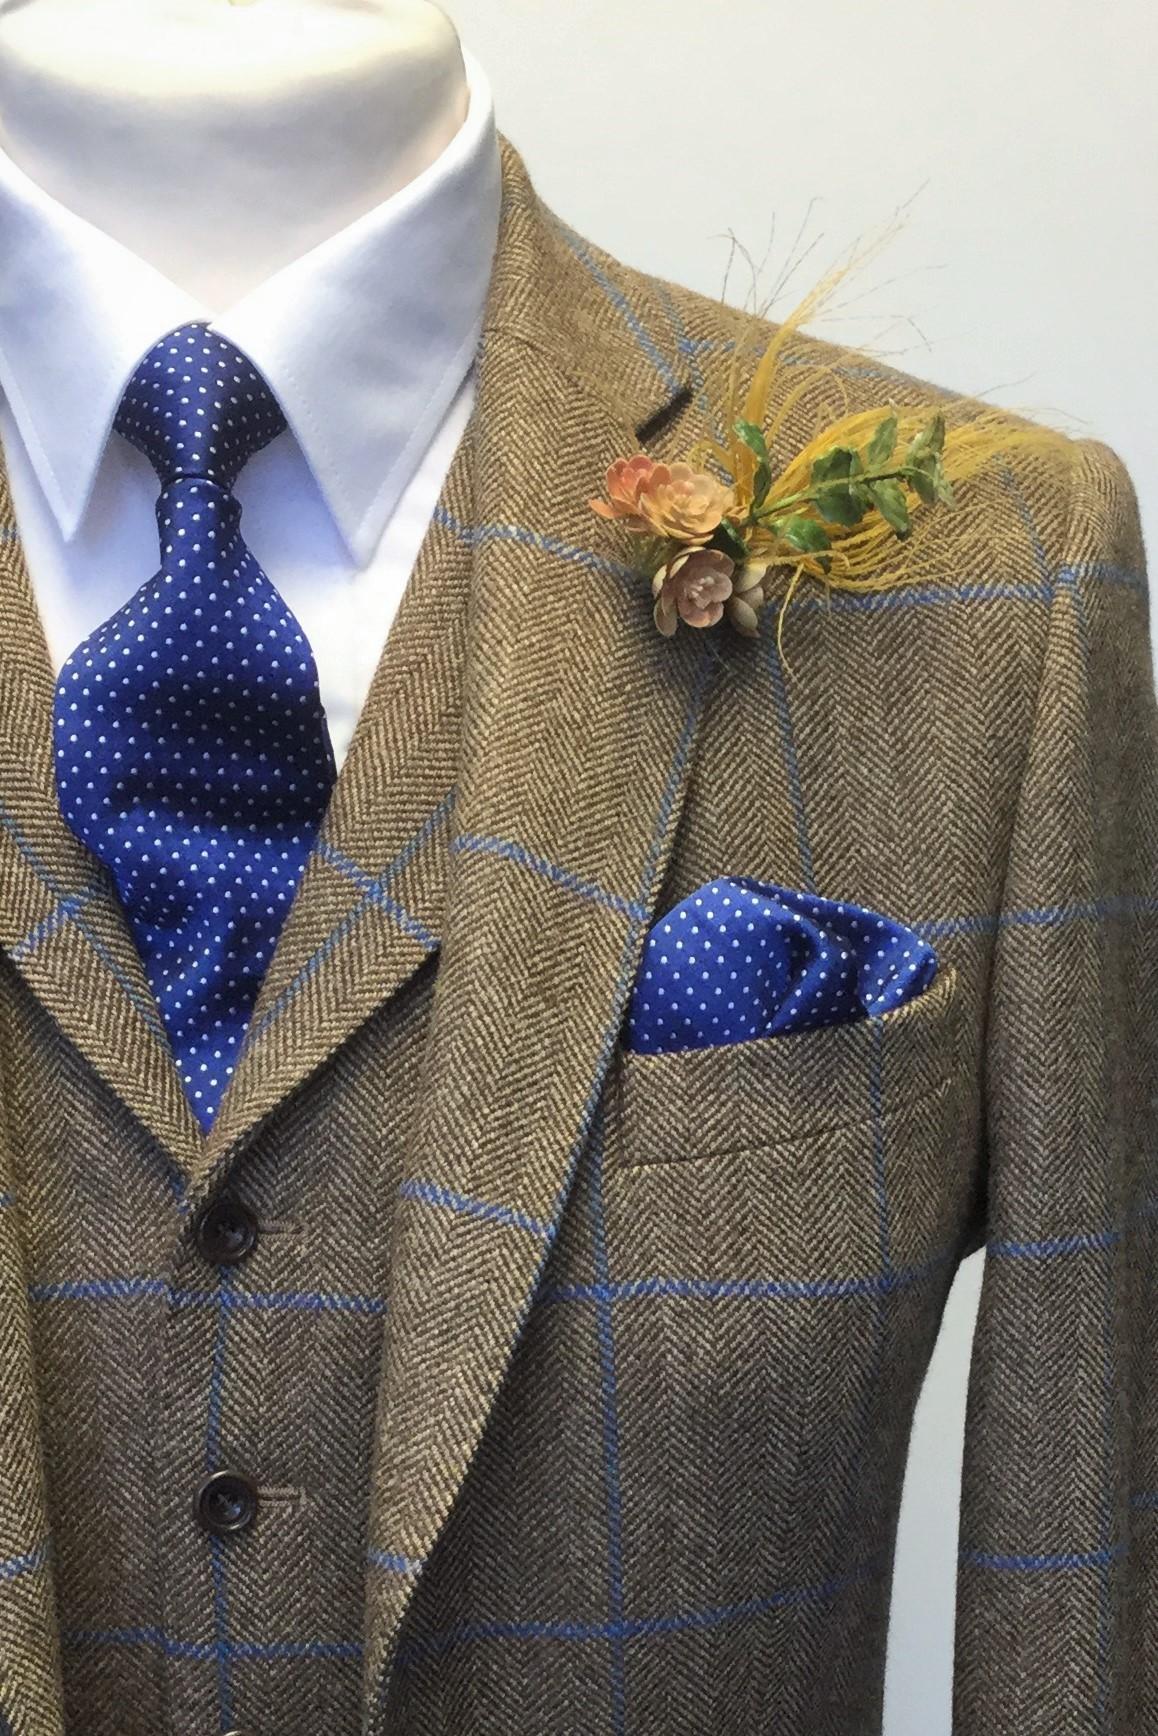 Caramel and Blue Tweed Mens Hire Wedding Suit with navy tie and handkerchief, by Black Tie Menswear, Berkshire